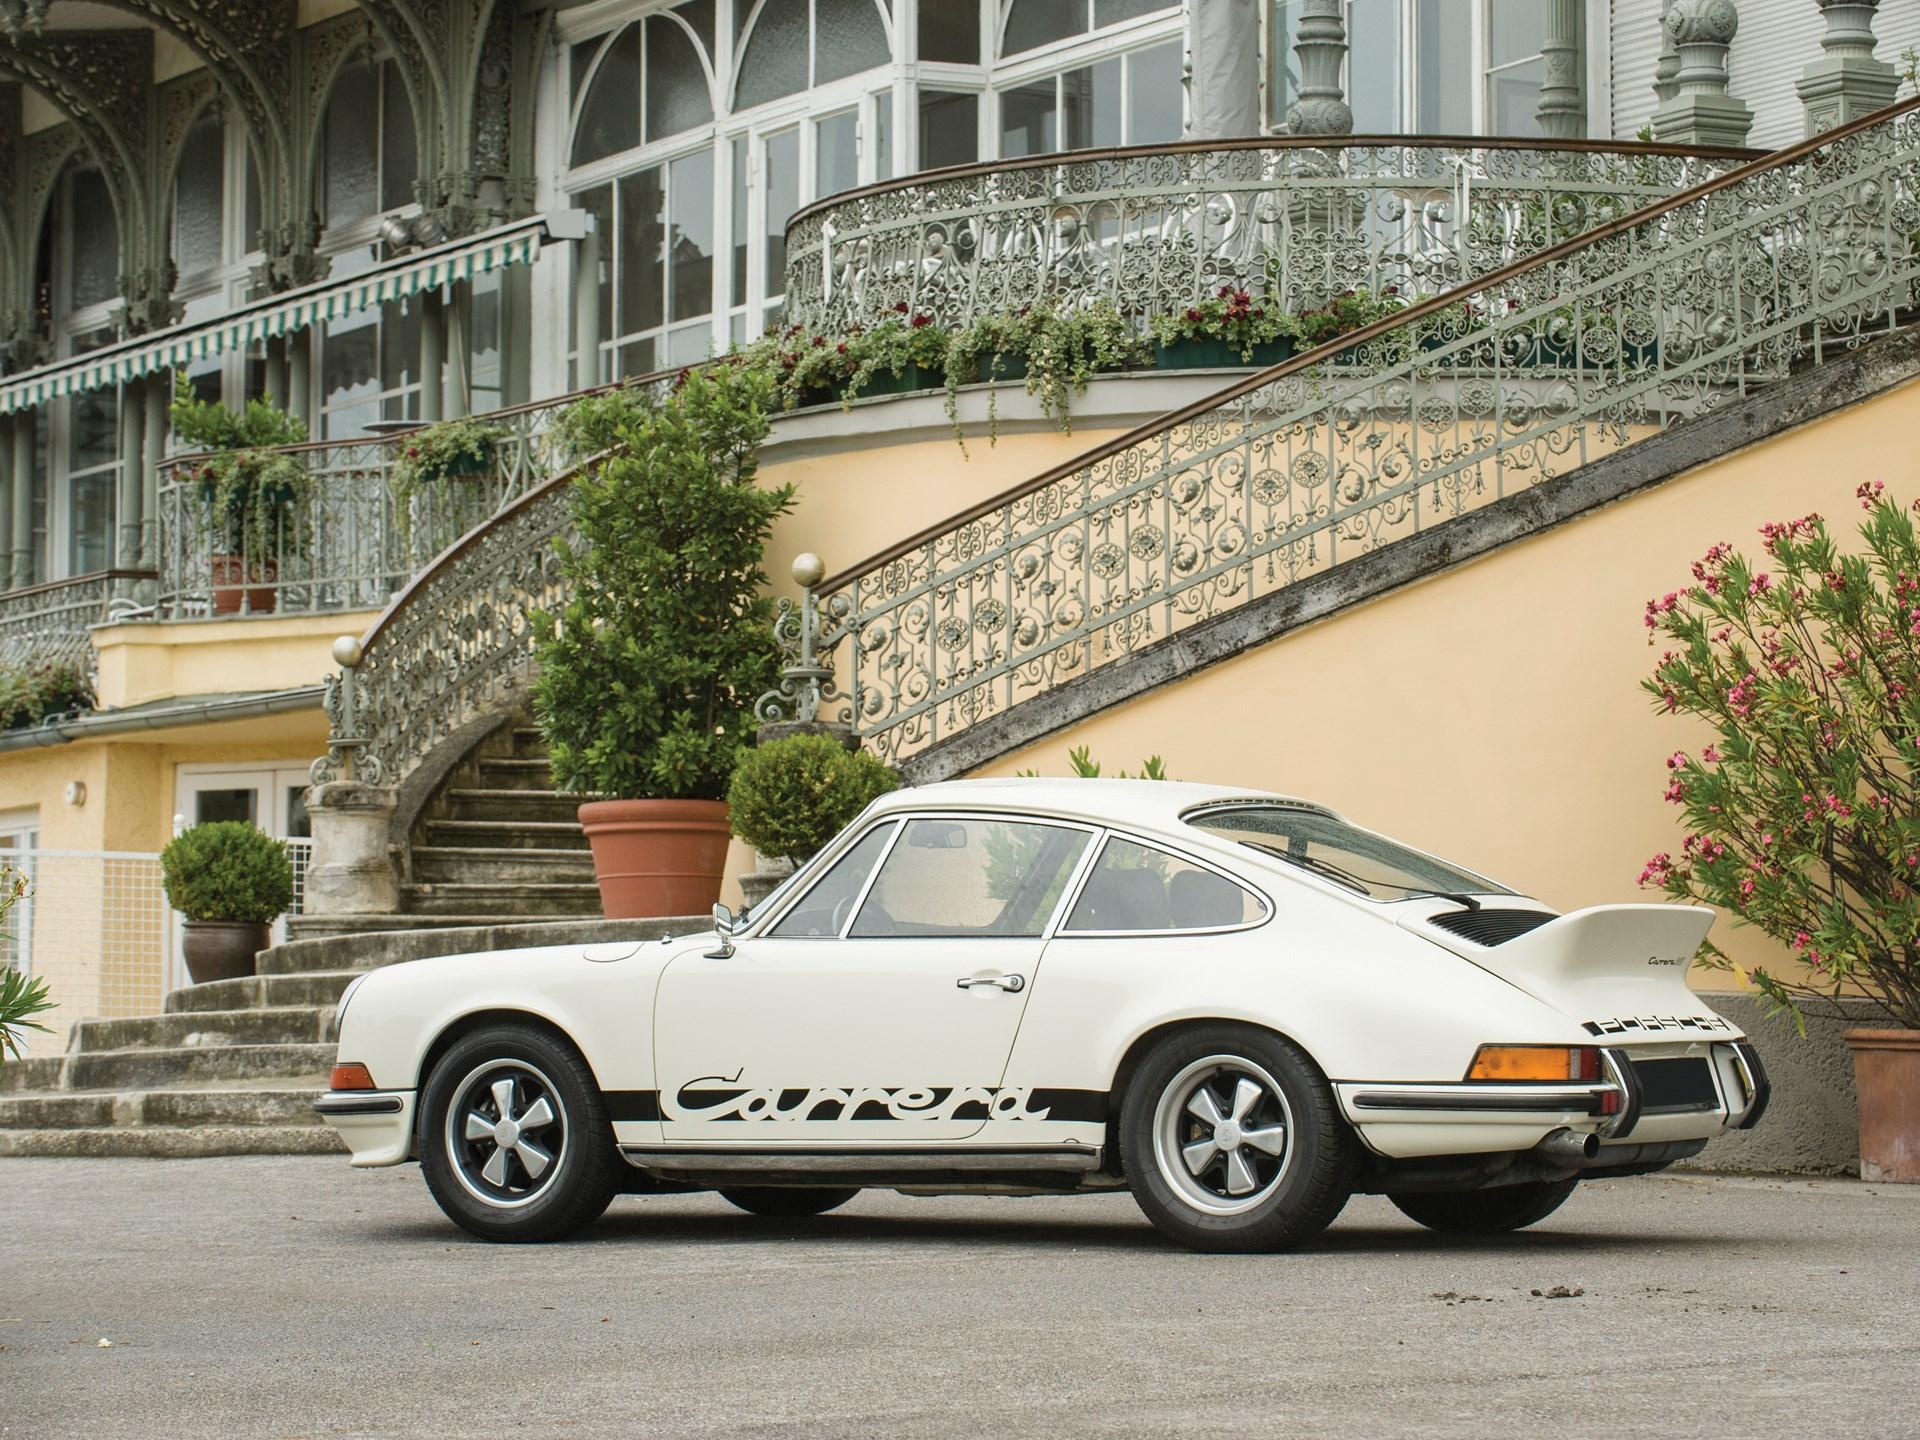 1972 Porsche 911 Carrera RS 2.7 Touring